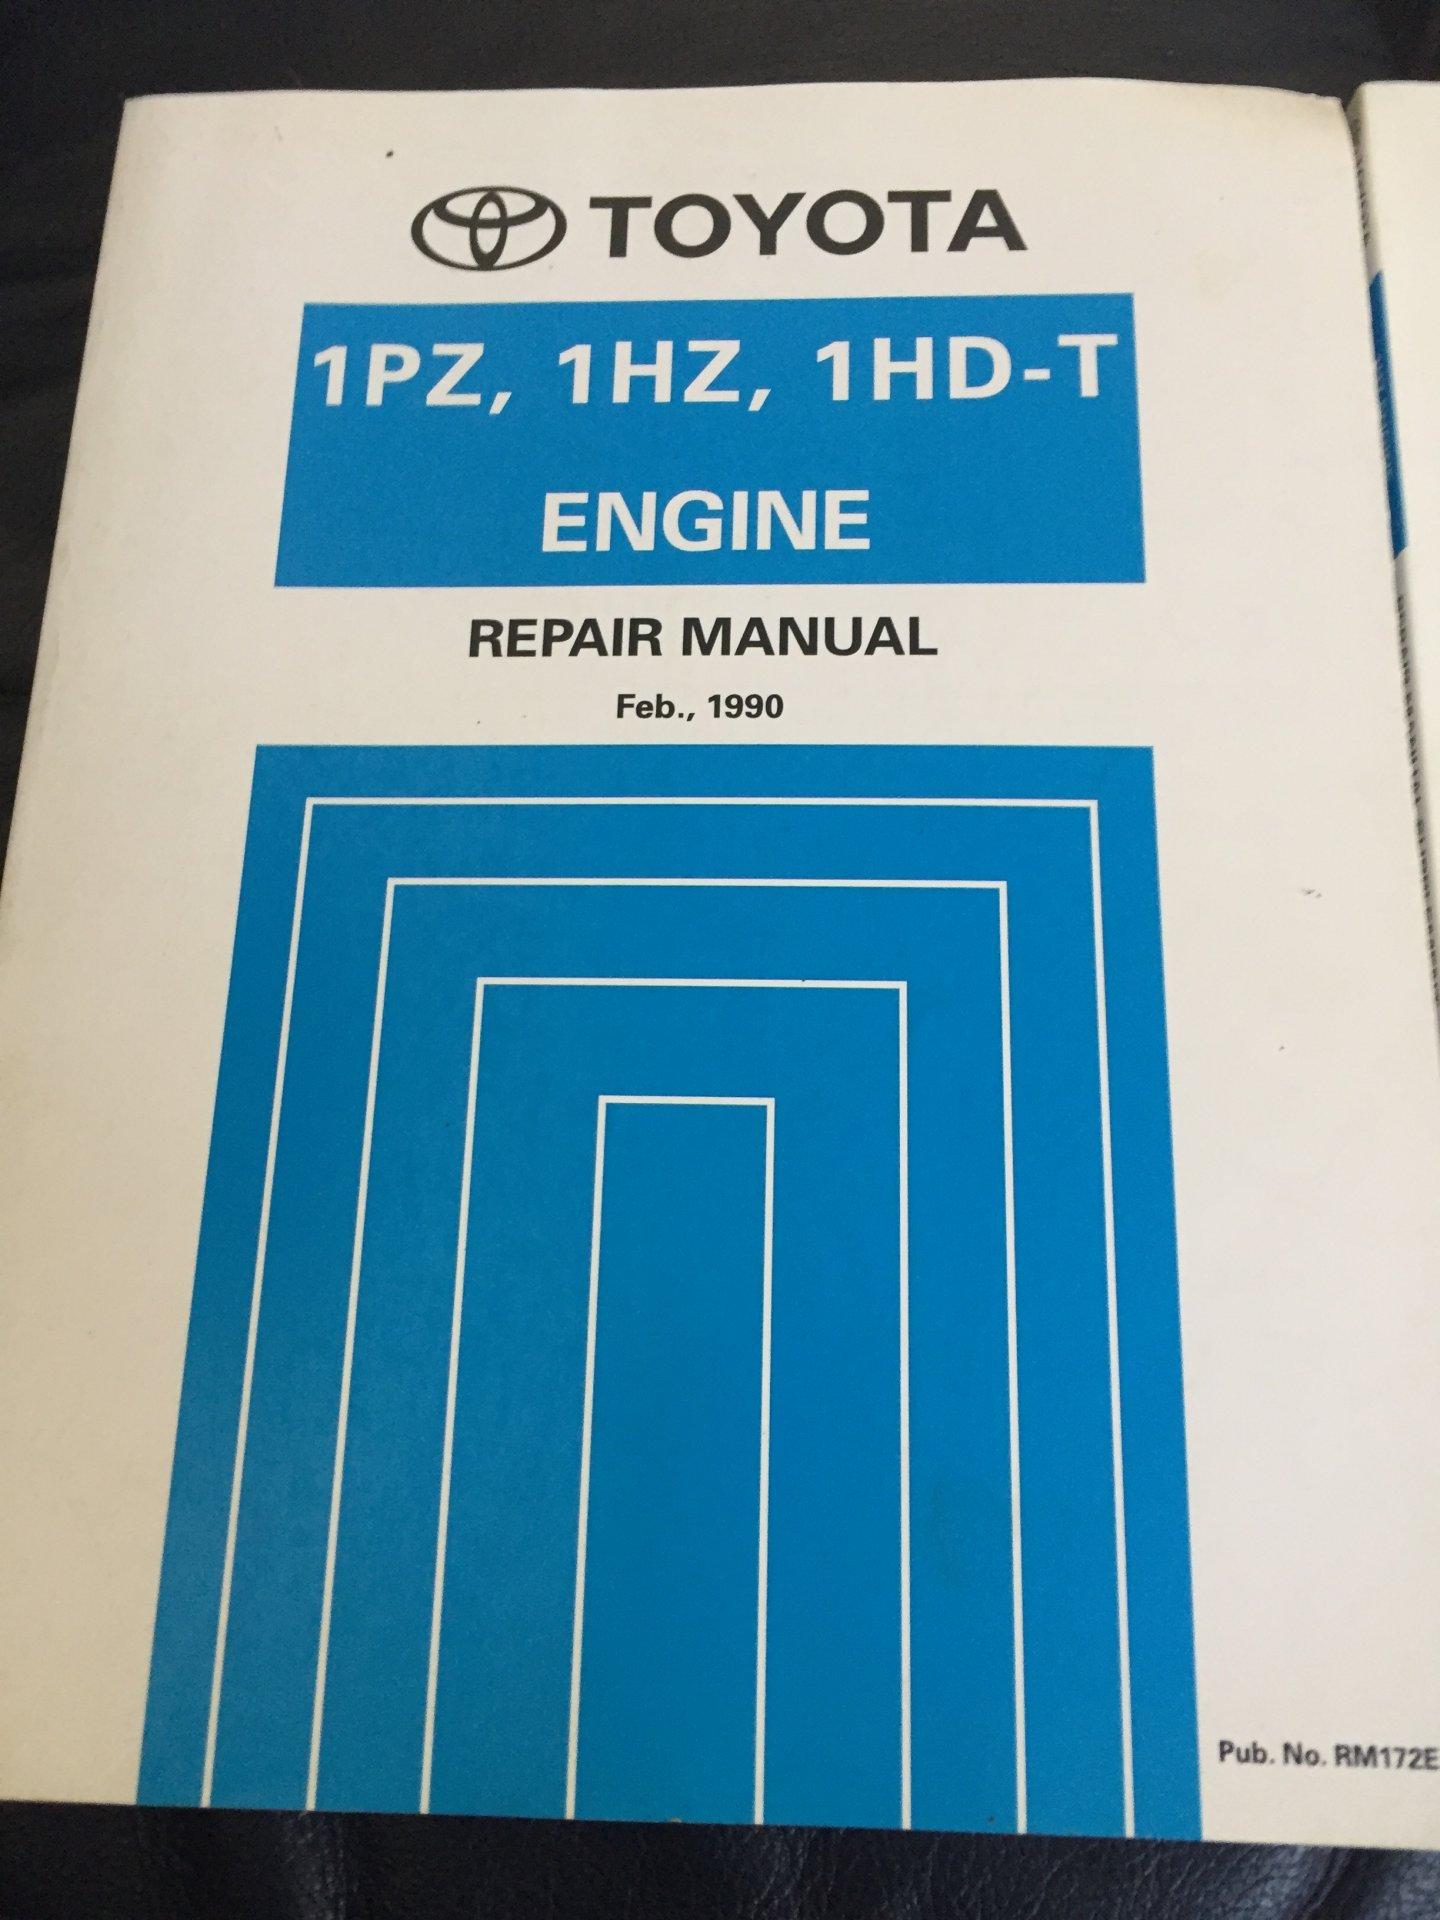 1990 Toyota manuals 003.JPG